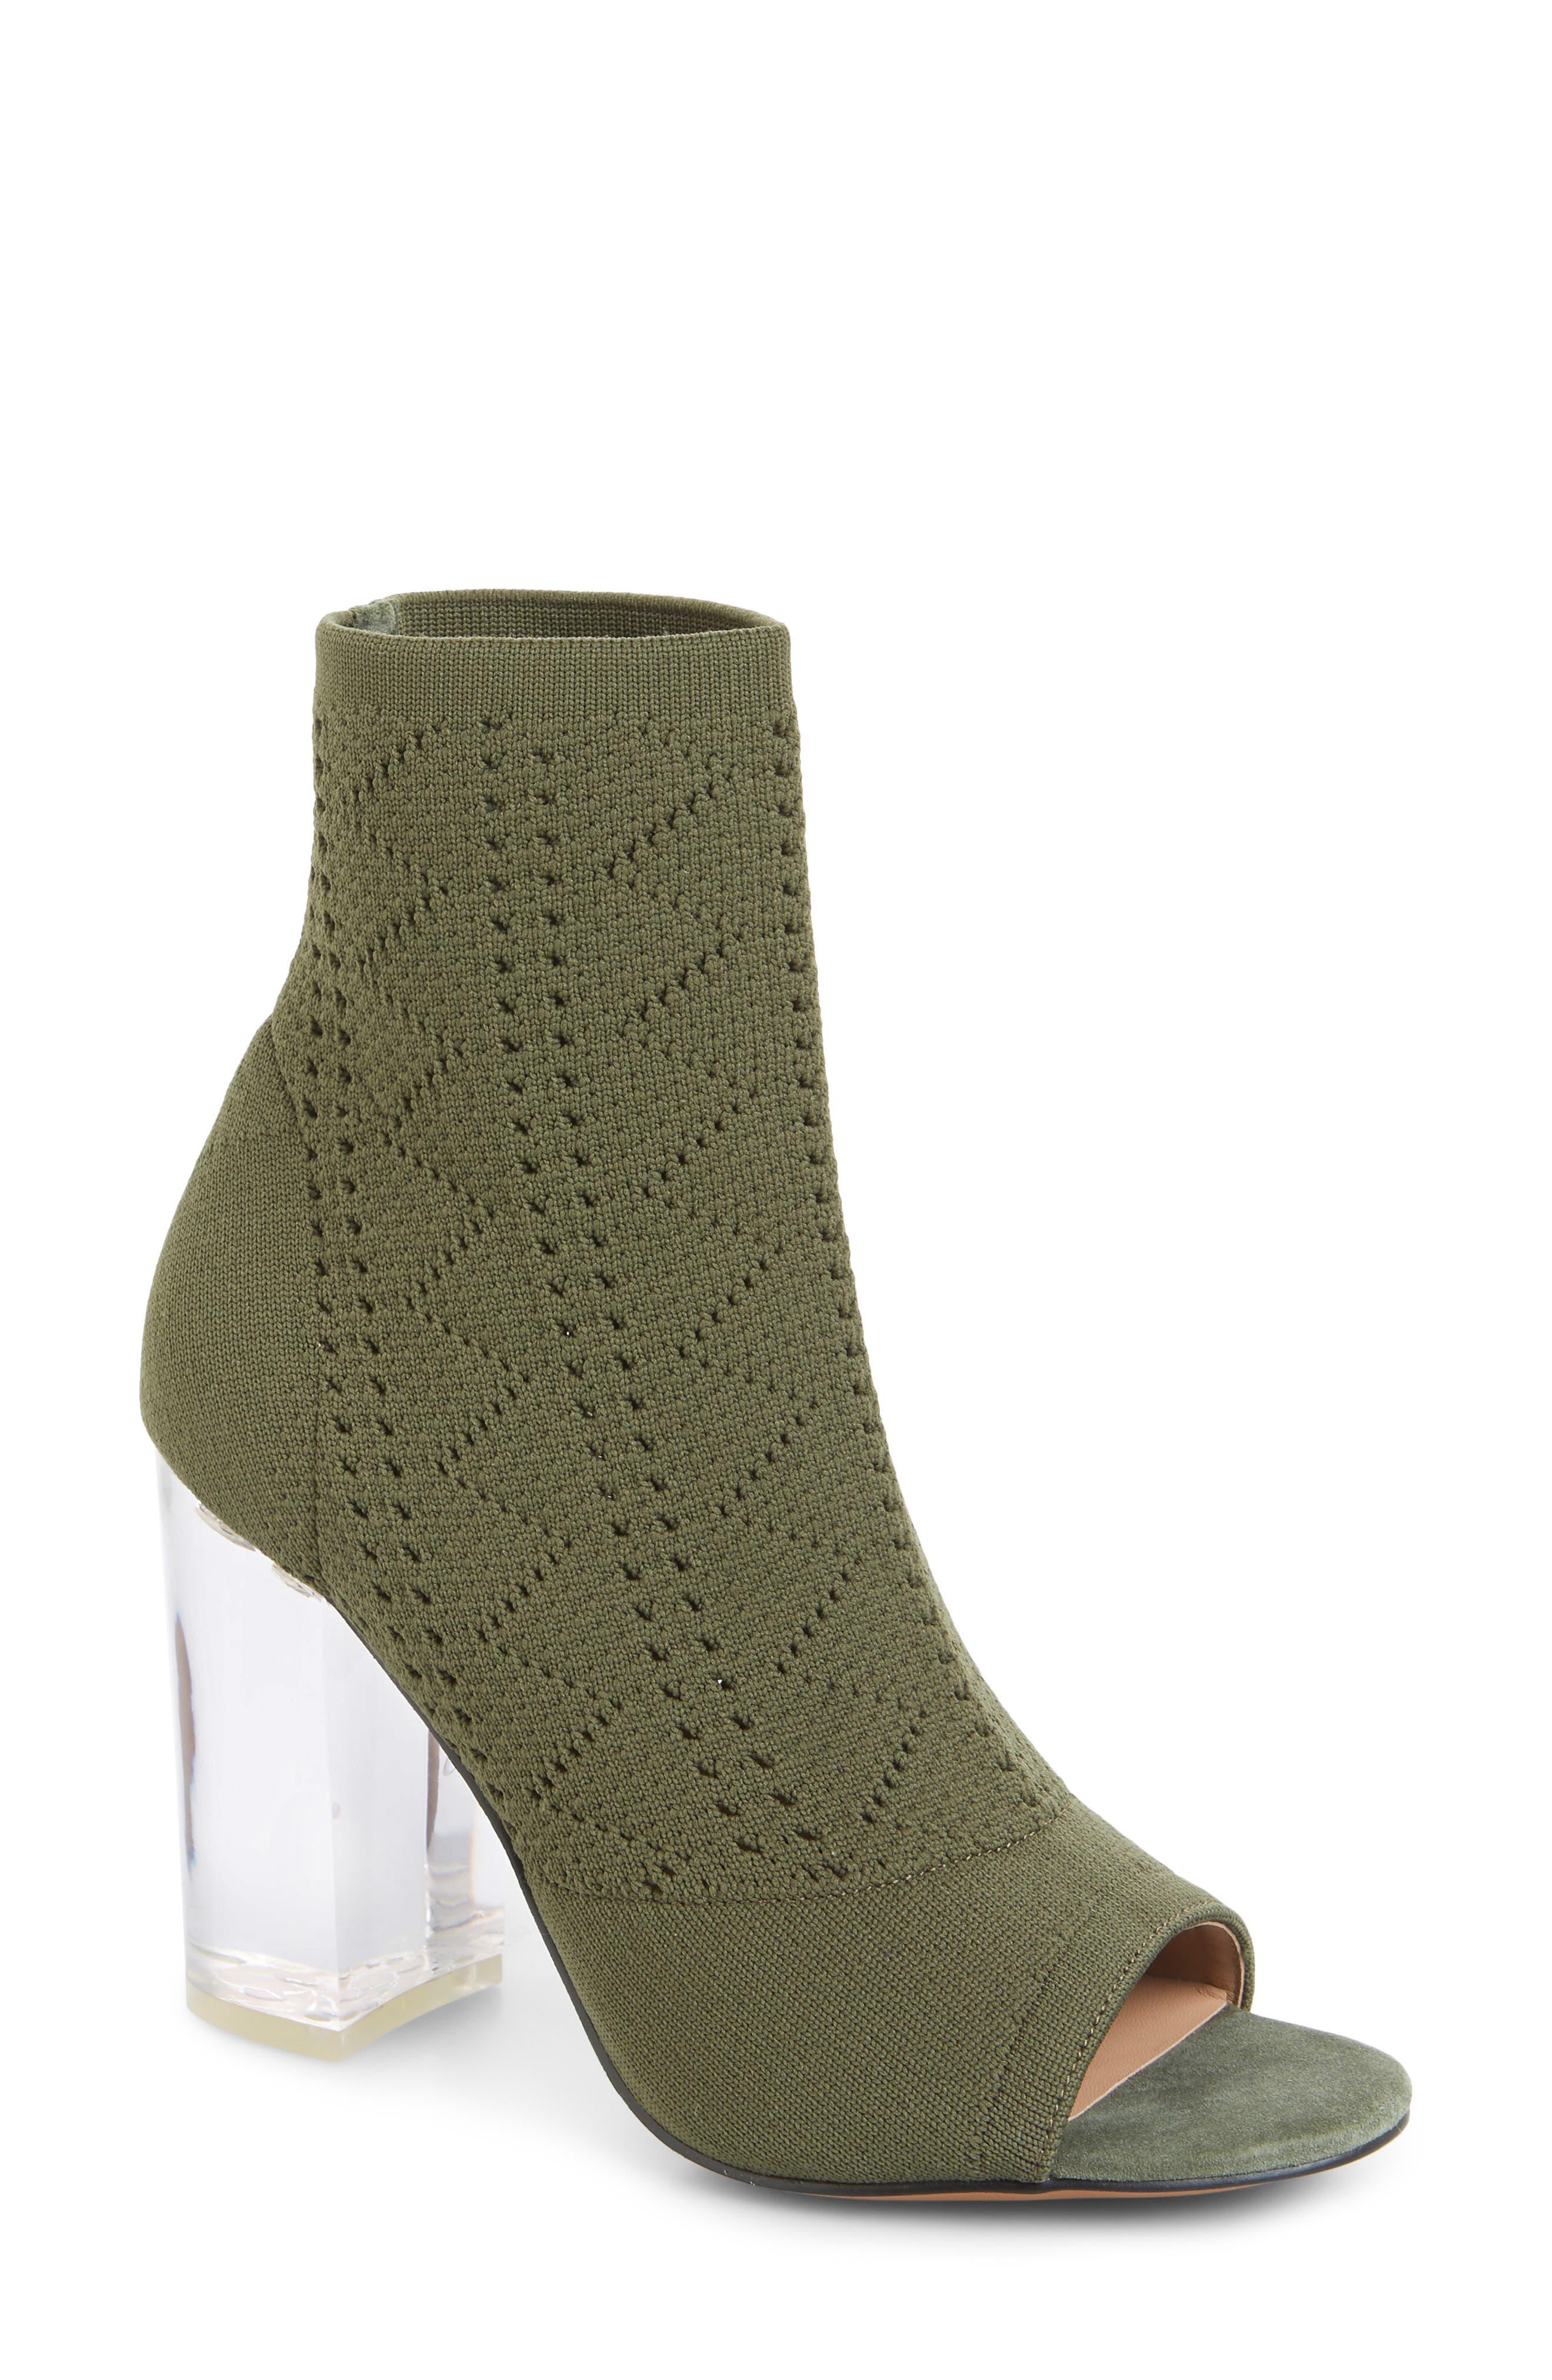 Linea Paolo Hollis Peep Toe Sock Bootie- Green